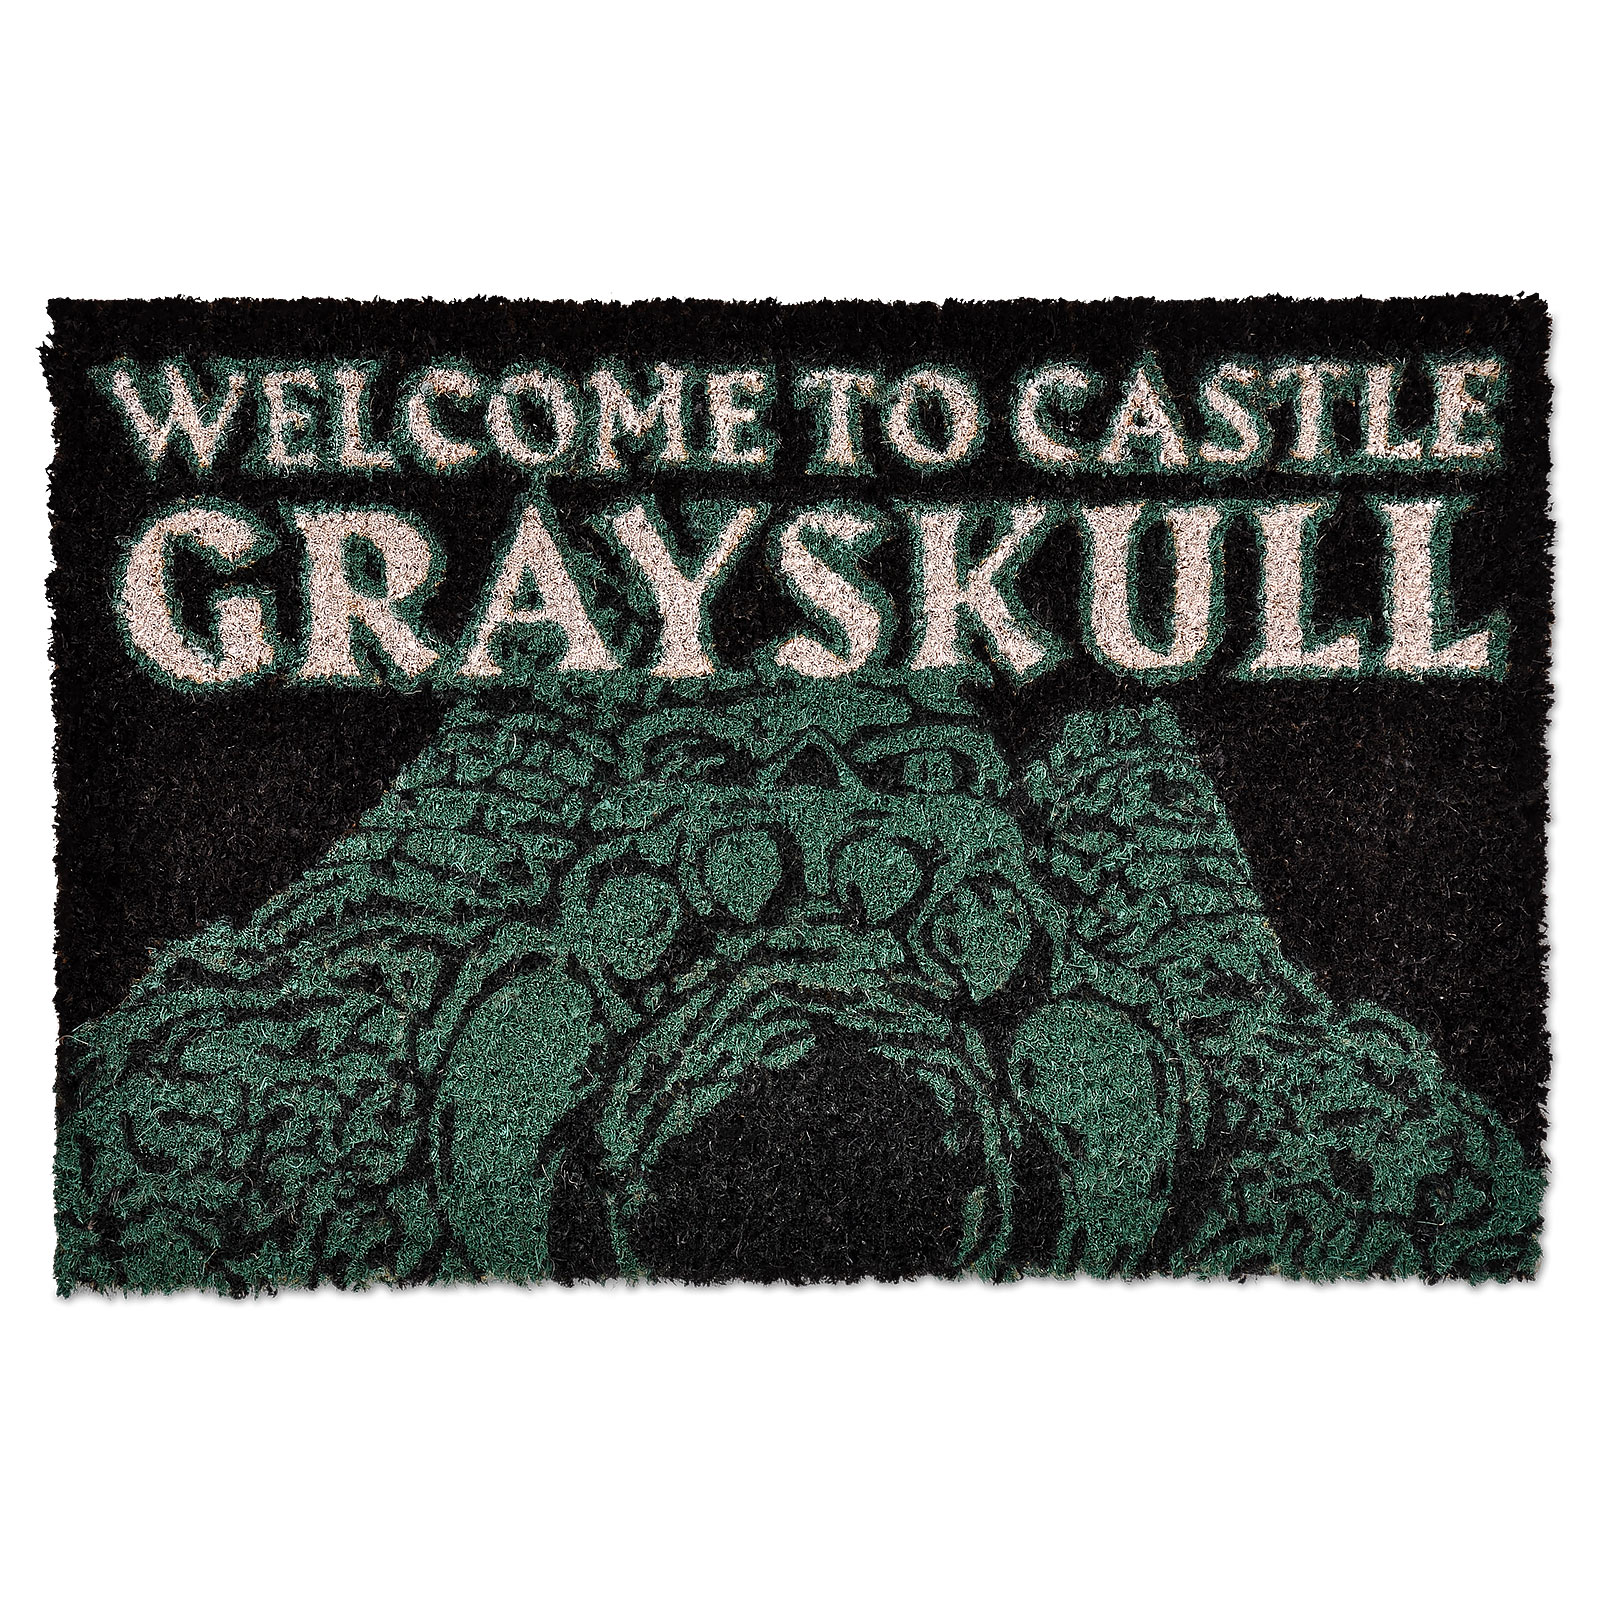 Masters of the Universe - Grayskull Fußmatte